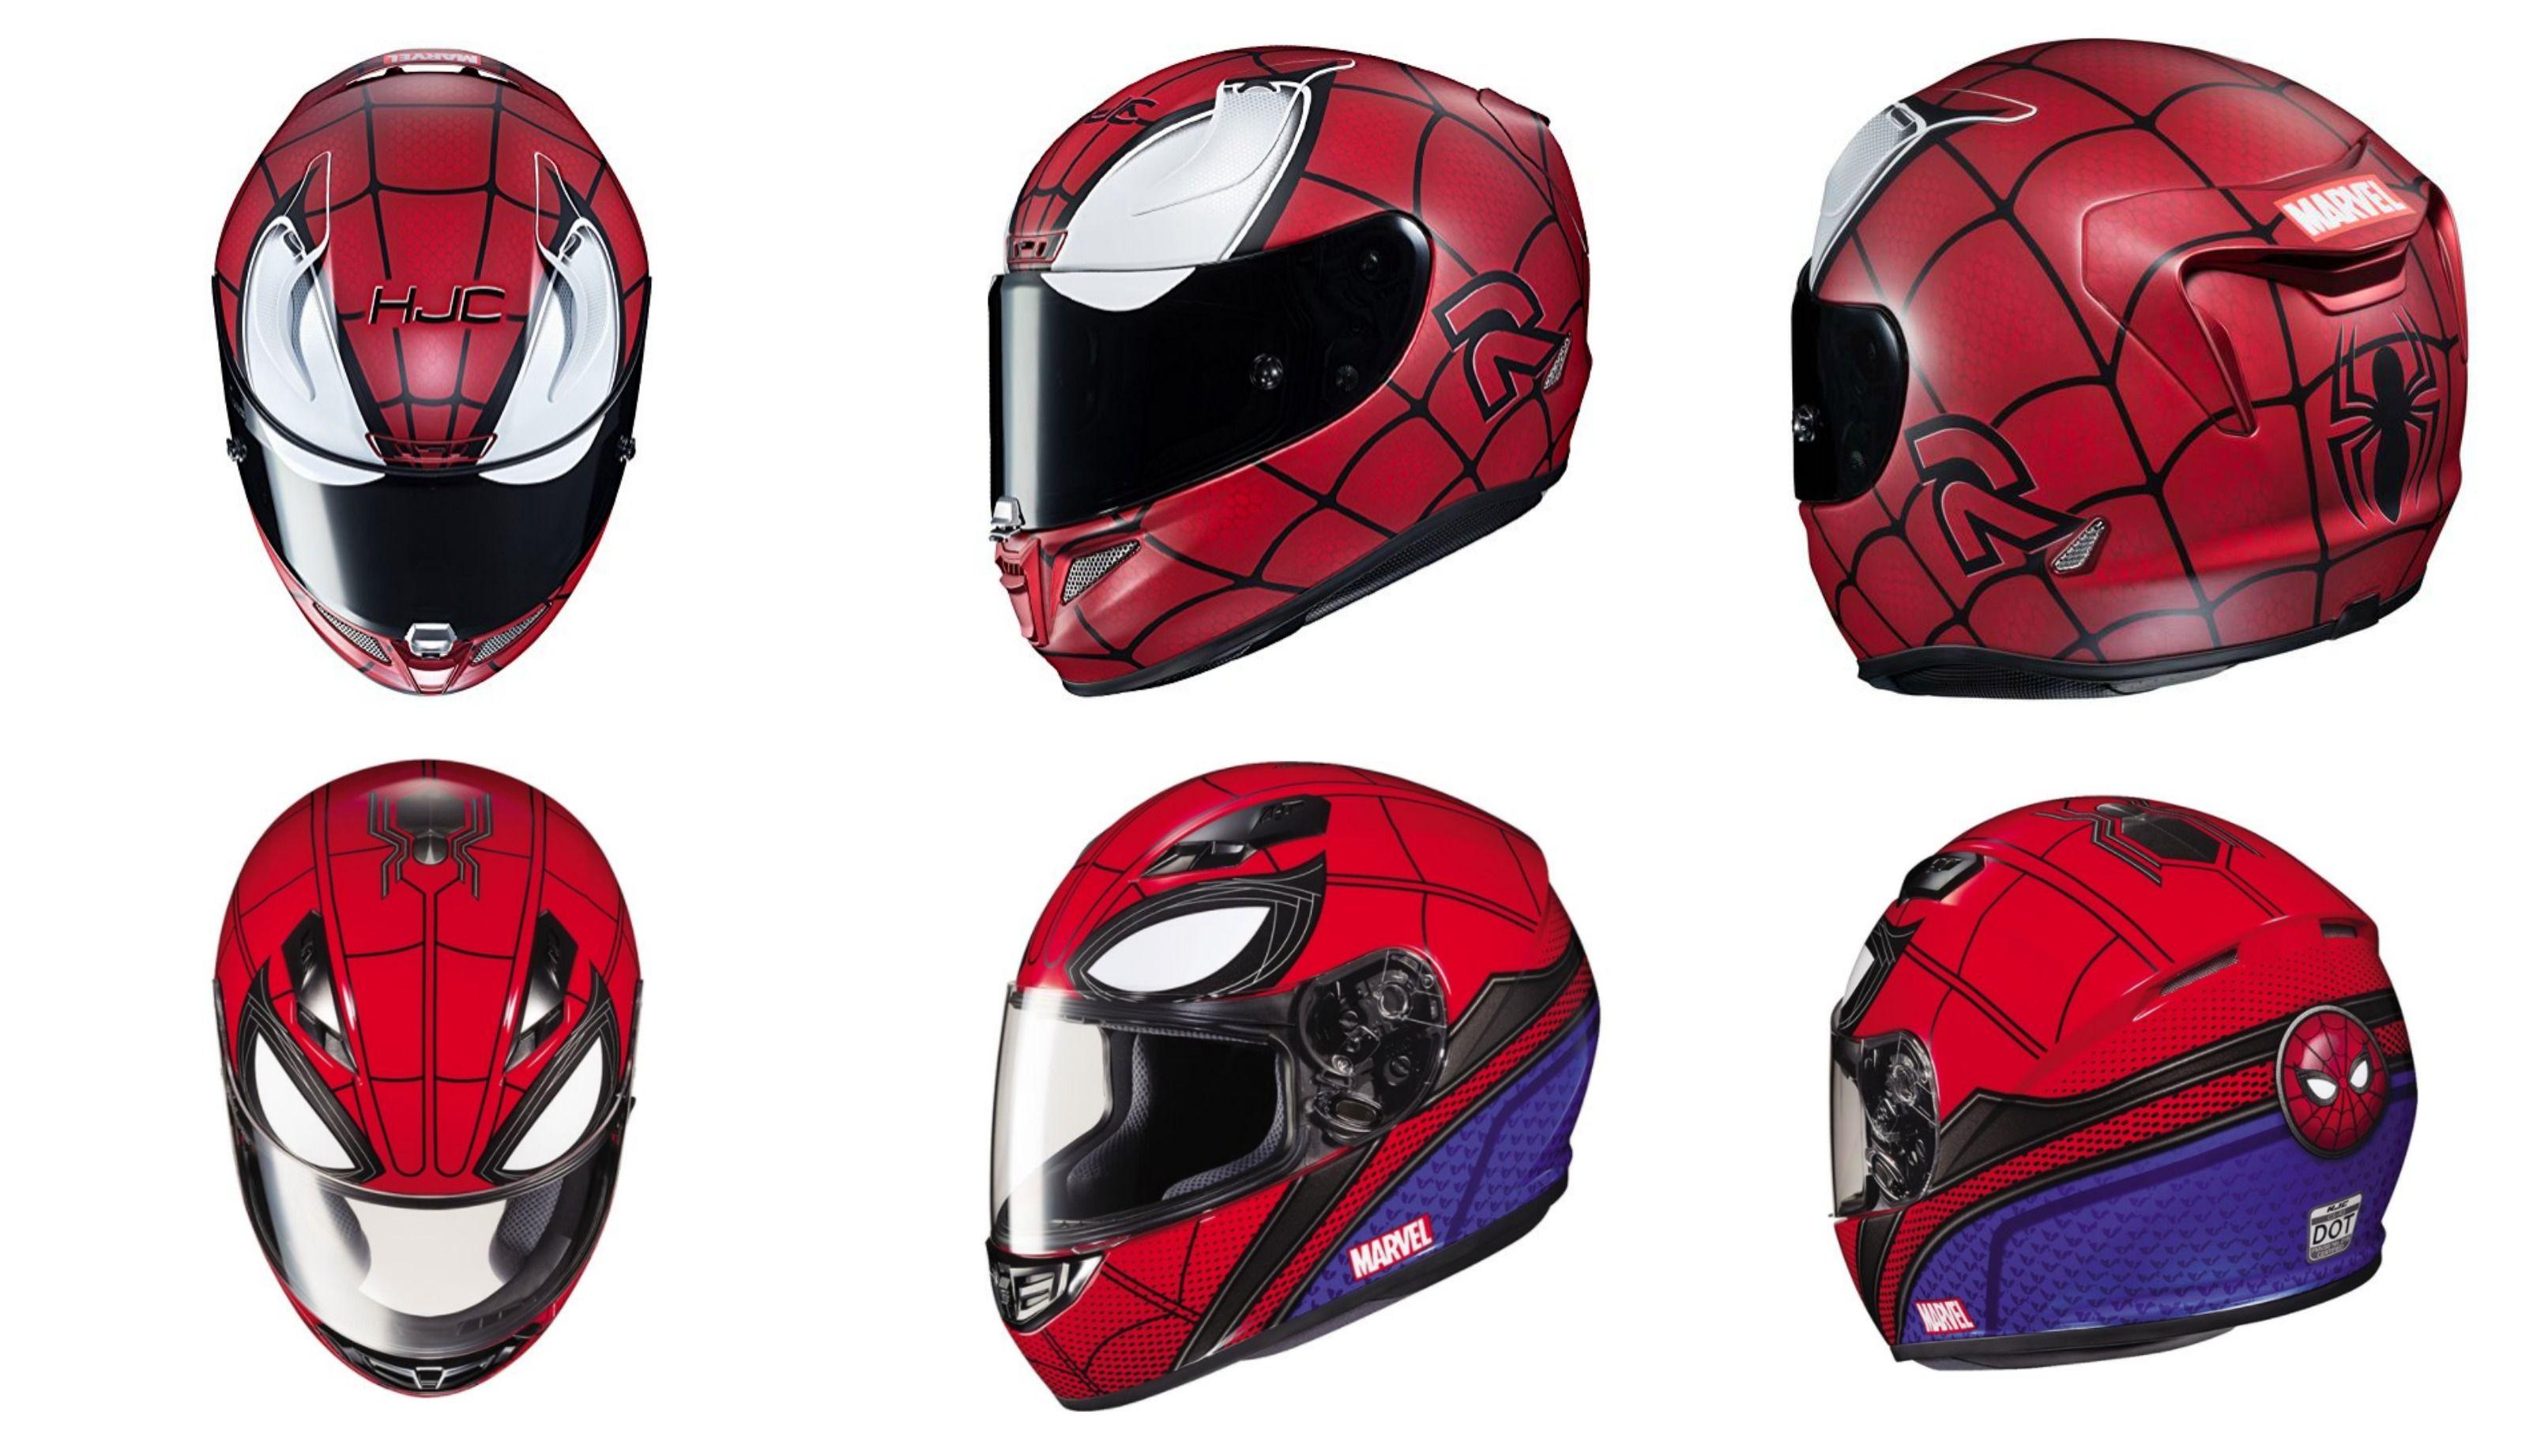 Spiderman Motorcycle Helmets With Images Motorcycle Helmets